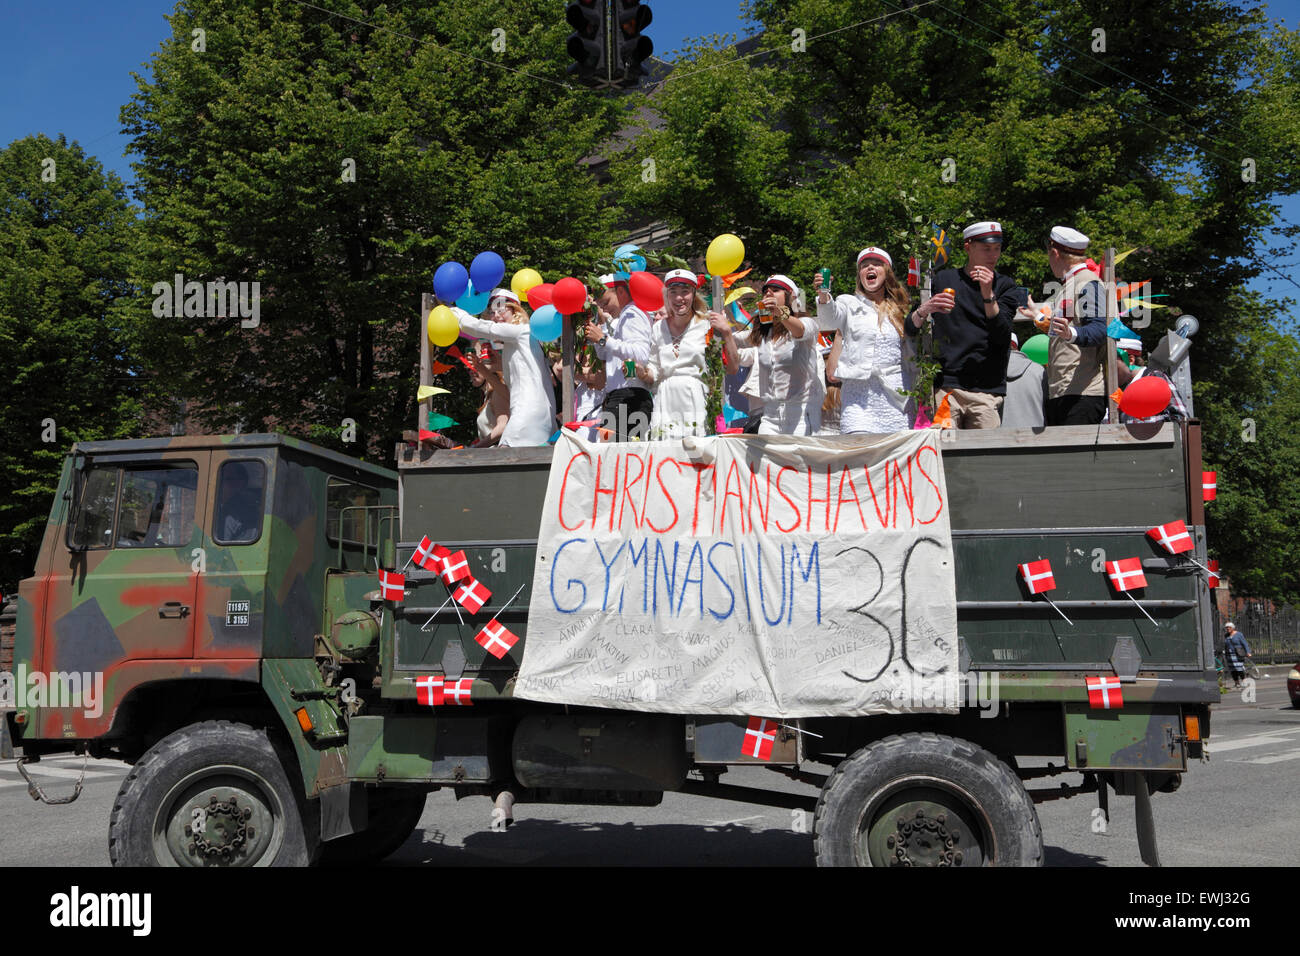 Christianshavn, Copenhagen, Denmark. June 26, 2015. Danish students celebrate their high school graduation. Students - Stock Image